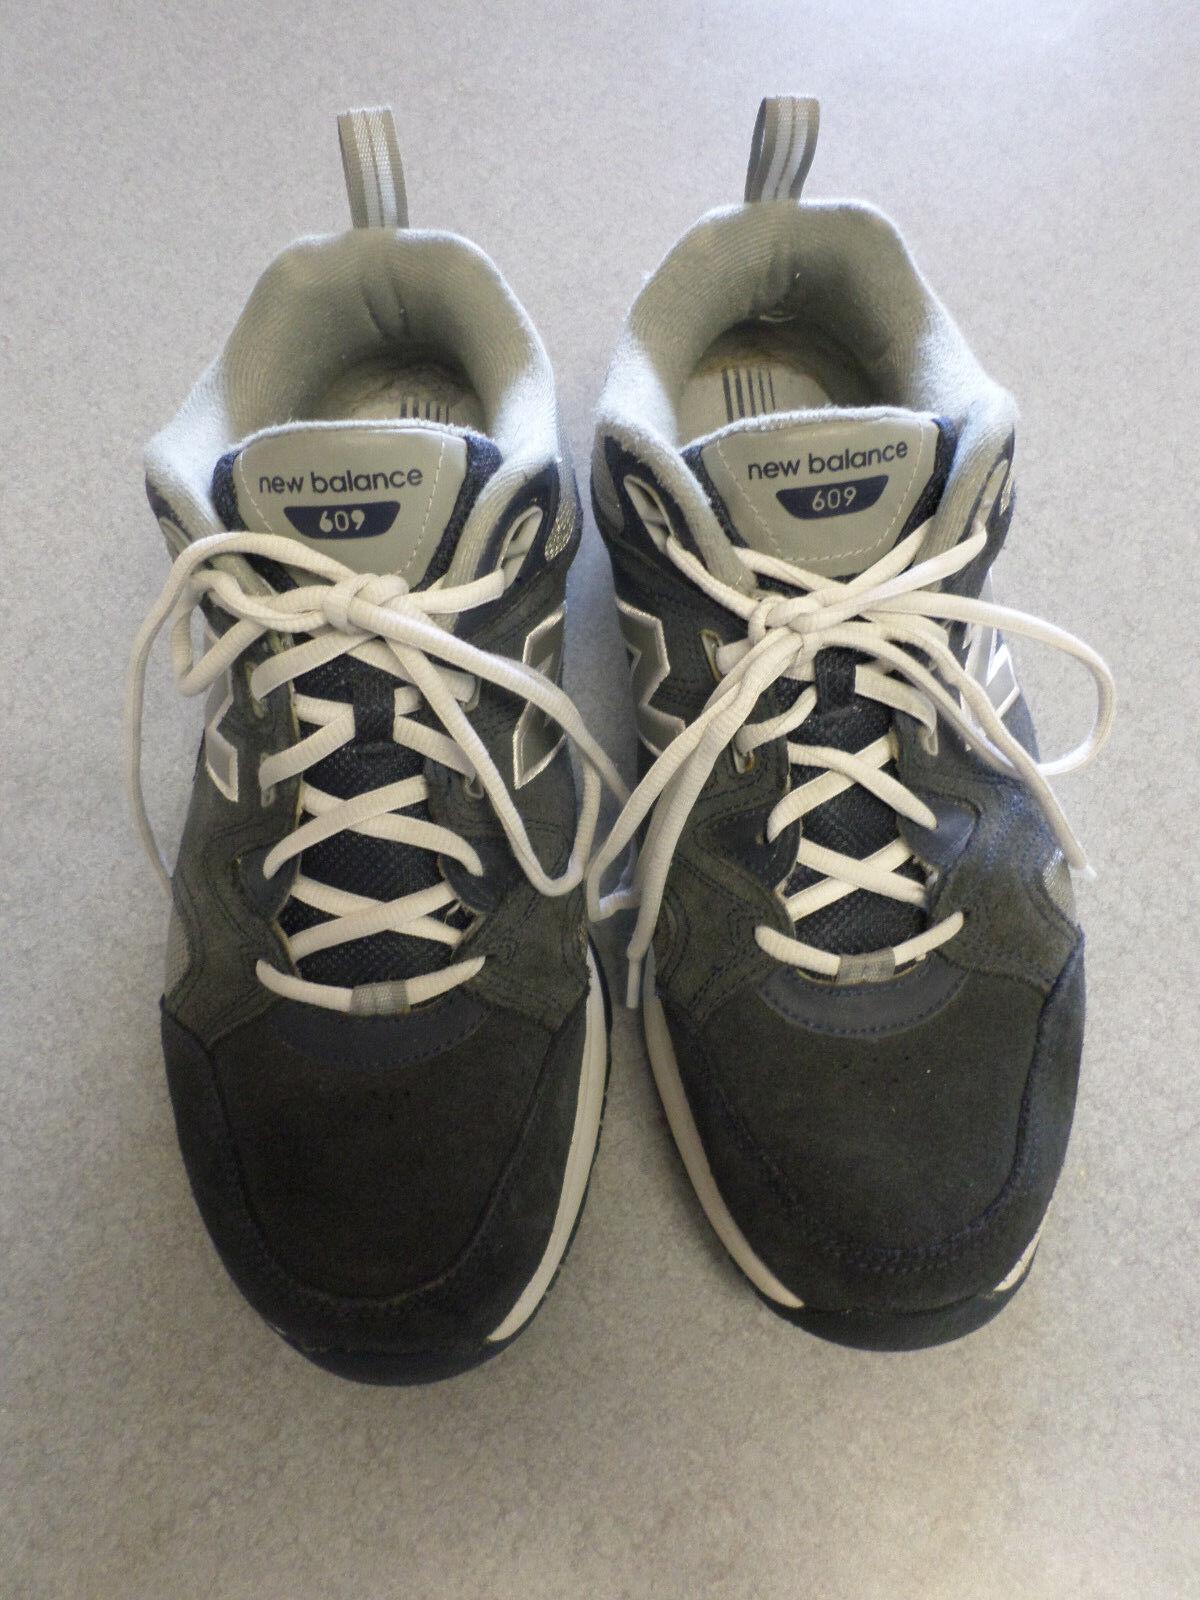 official photos 37e6d 55942 Adidas Superstar XENO Athletic Shoes Men s Size 10 Vivid Red Reflective  AQ8181,. Nike Kaishi NS 747492-010 Black White ...